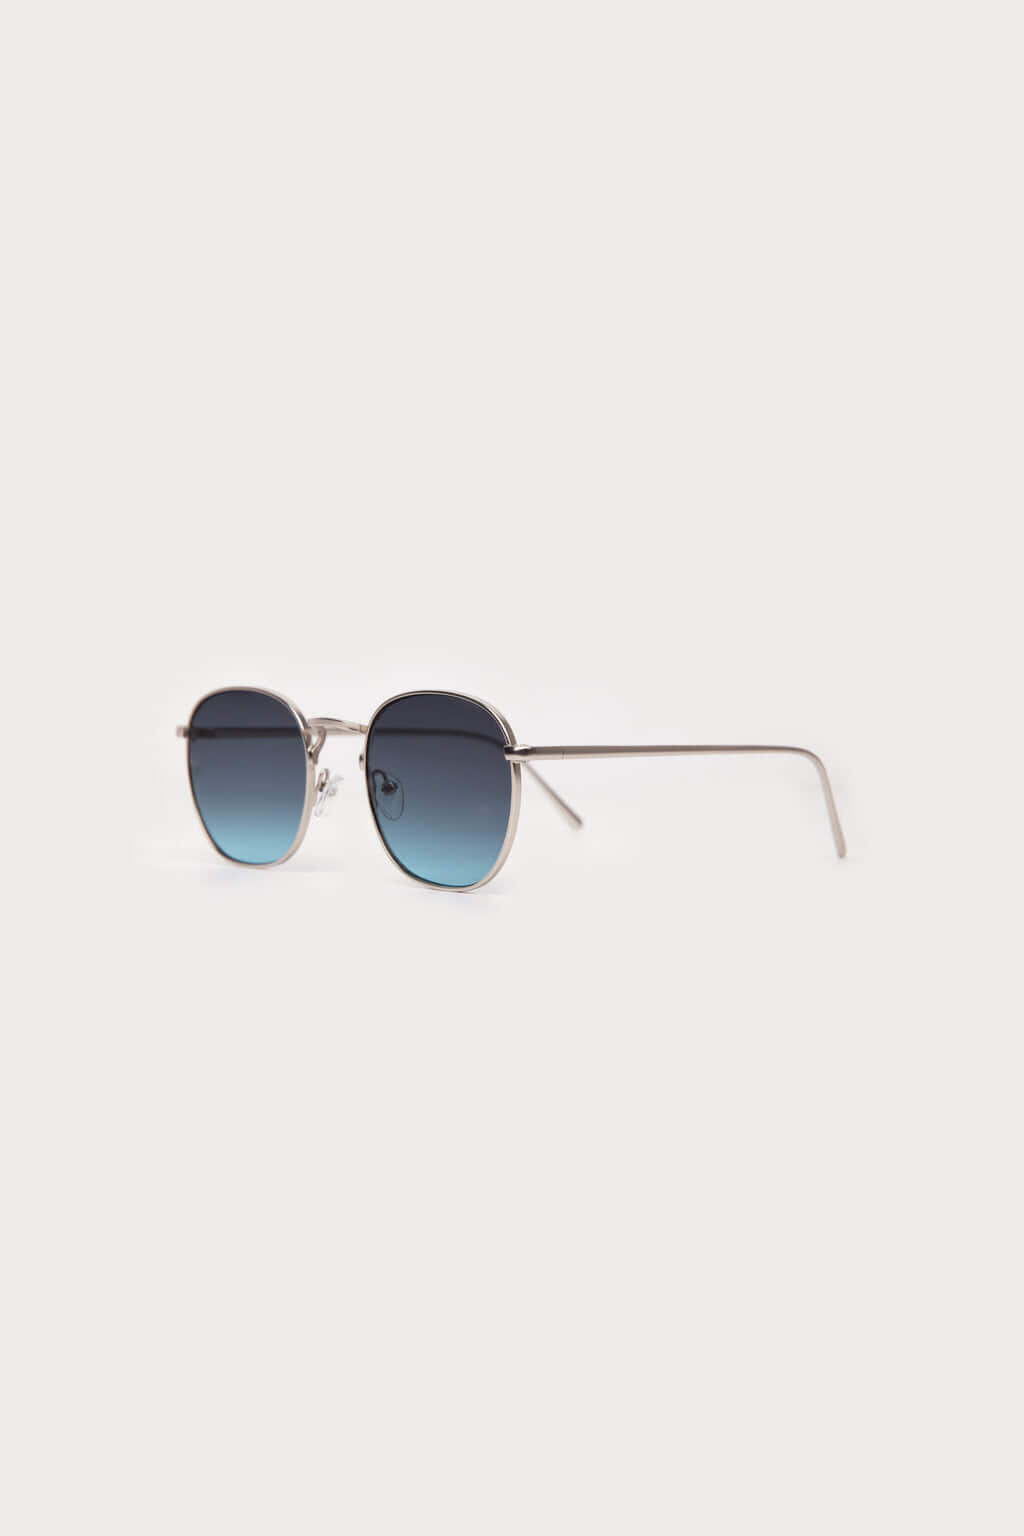 Sunglass 3370 Blue 6